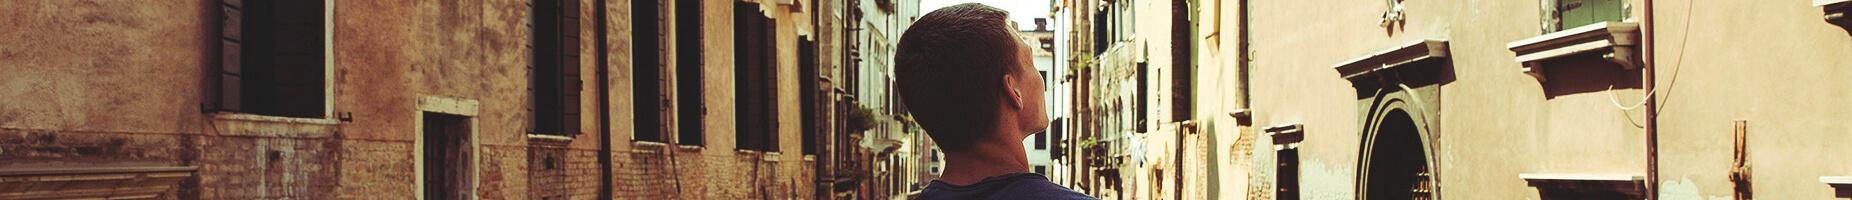 man in Italy looking at buildings